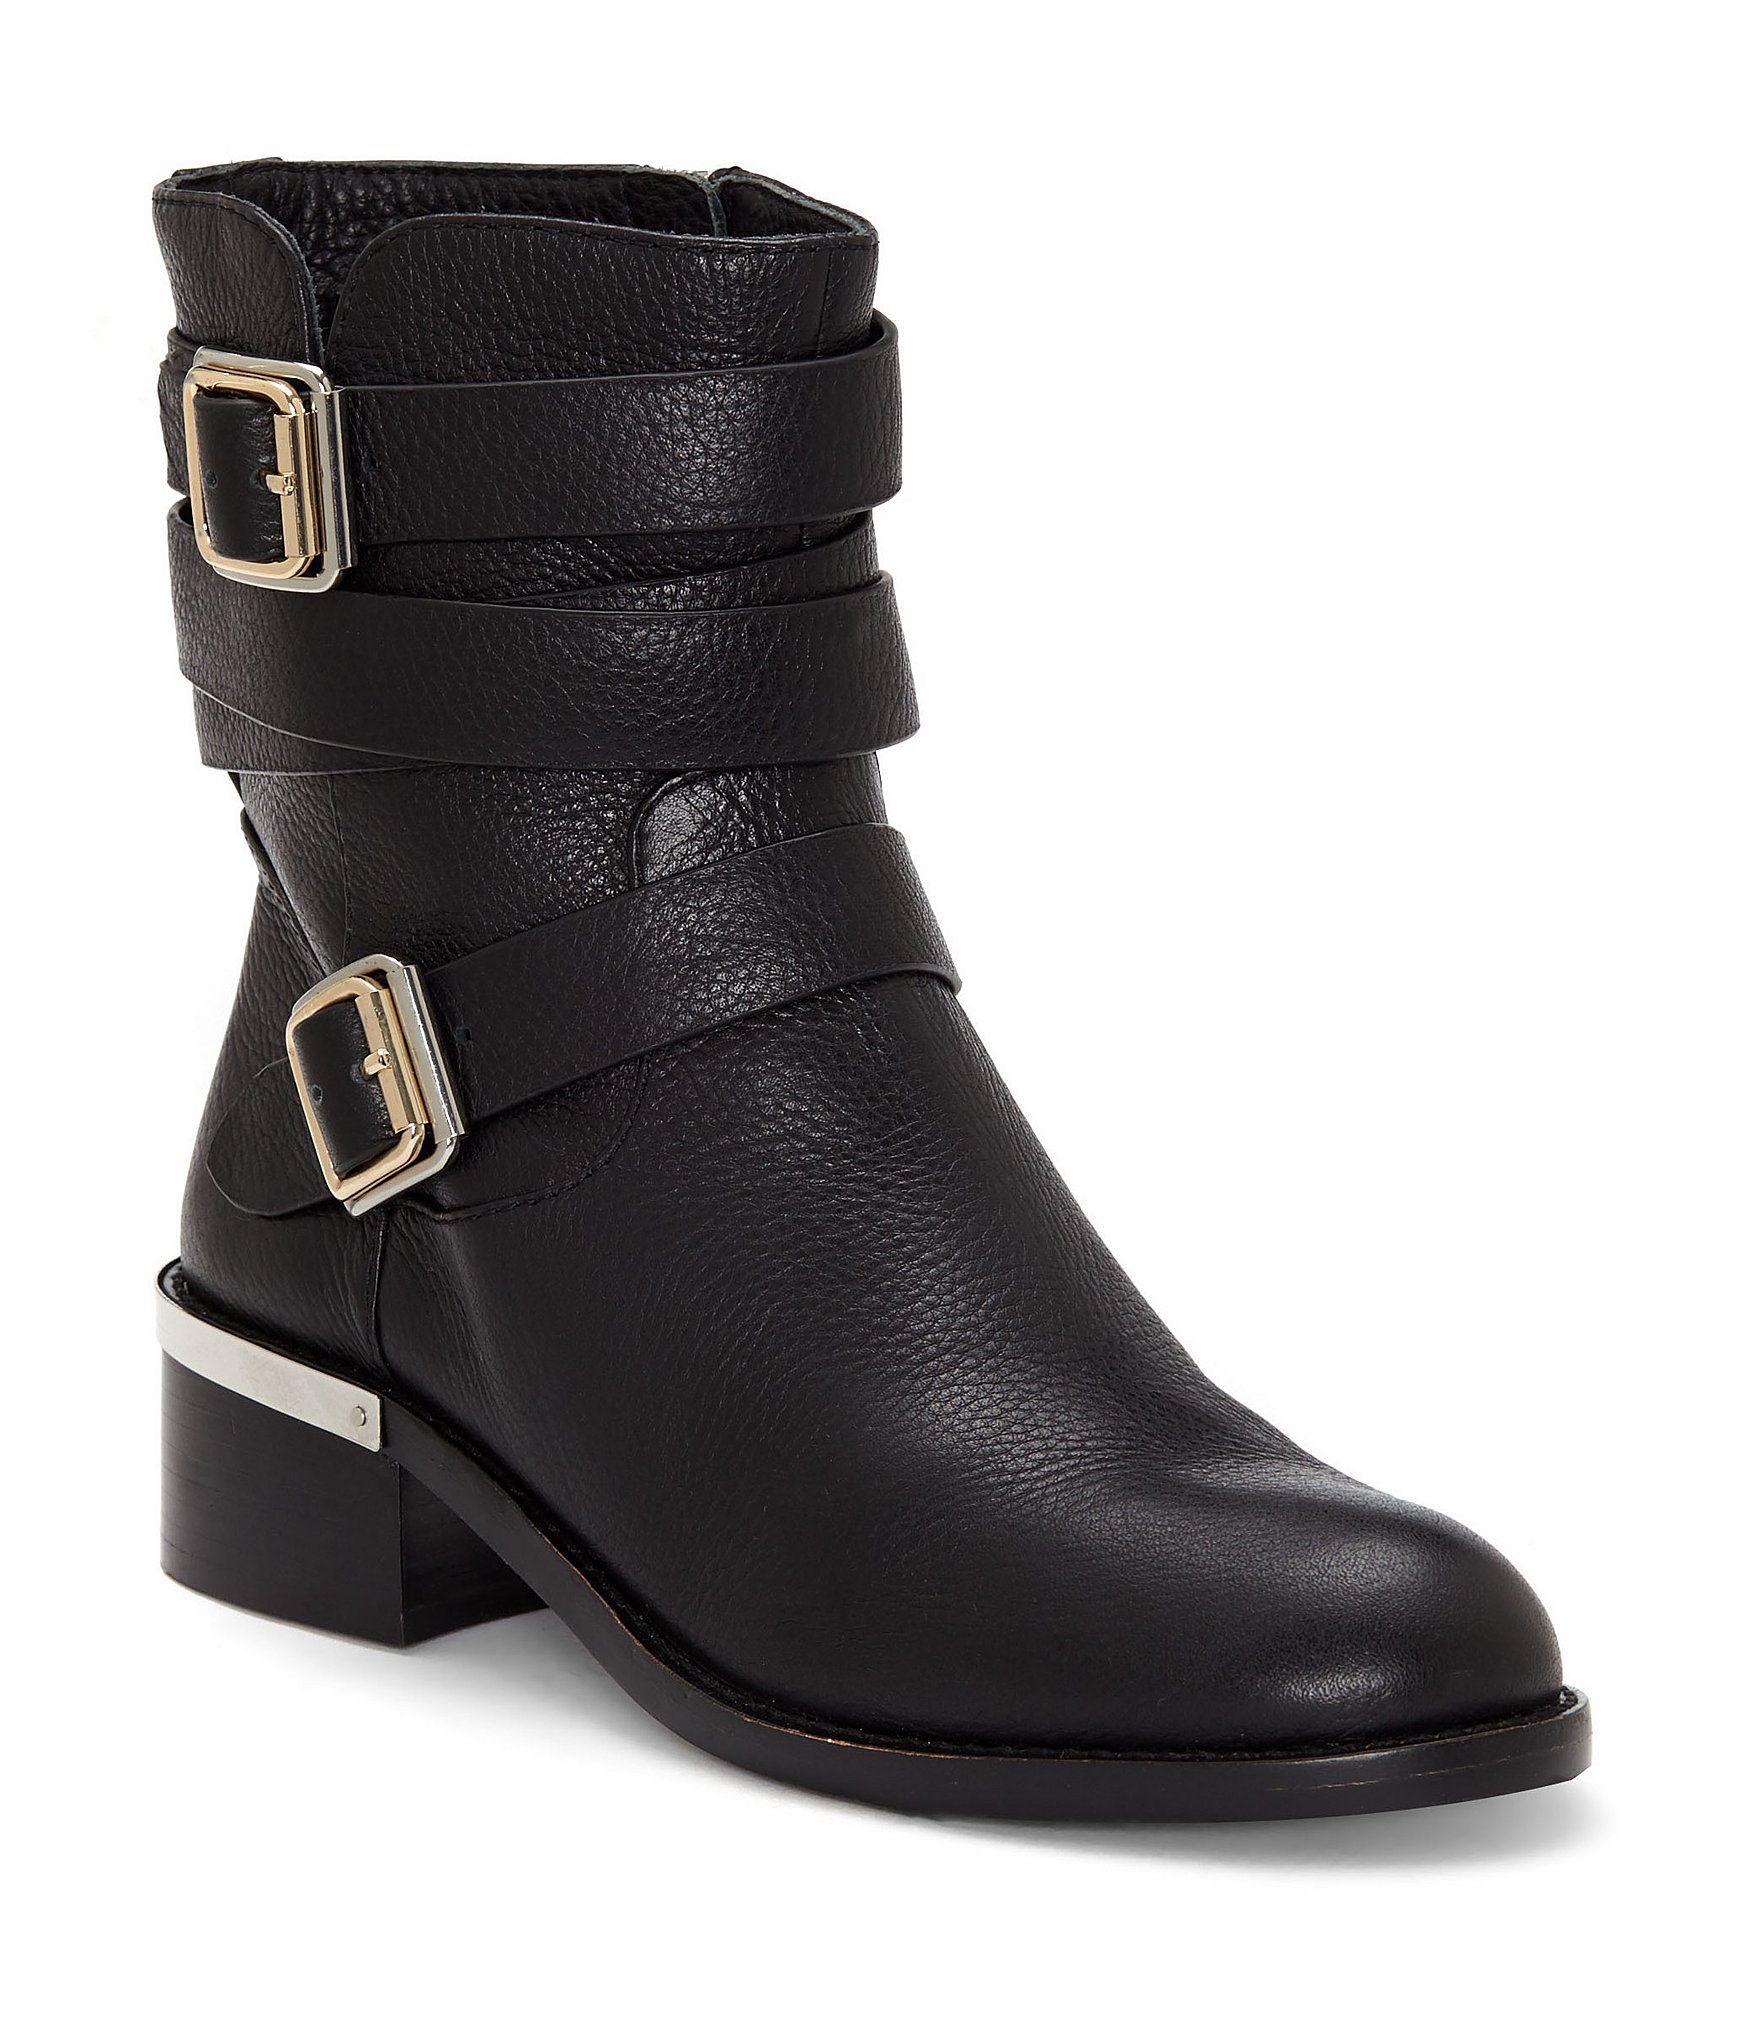 f8ef3b7eb49 Vince Camuto Webey Leather Block Heel Boots #Dillards   Fashion ...